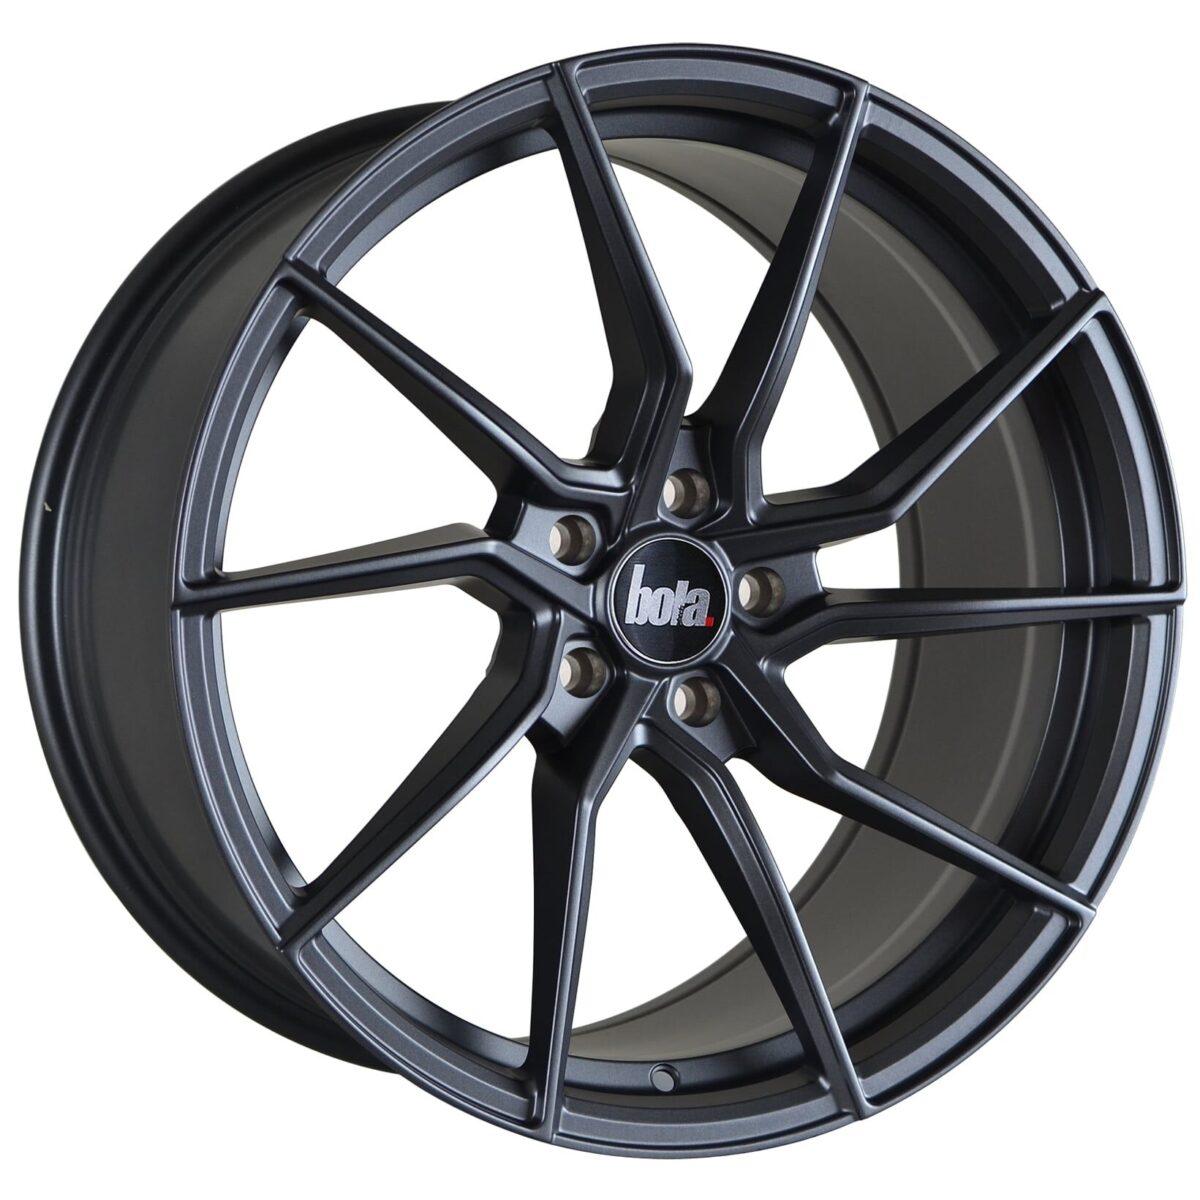 "18"" BOLA B25 Wheels - Matt Gunmetal - VW / Audi / Mercedes - 5x112"